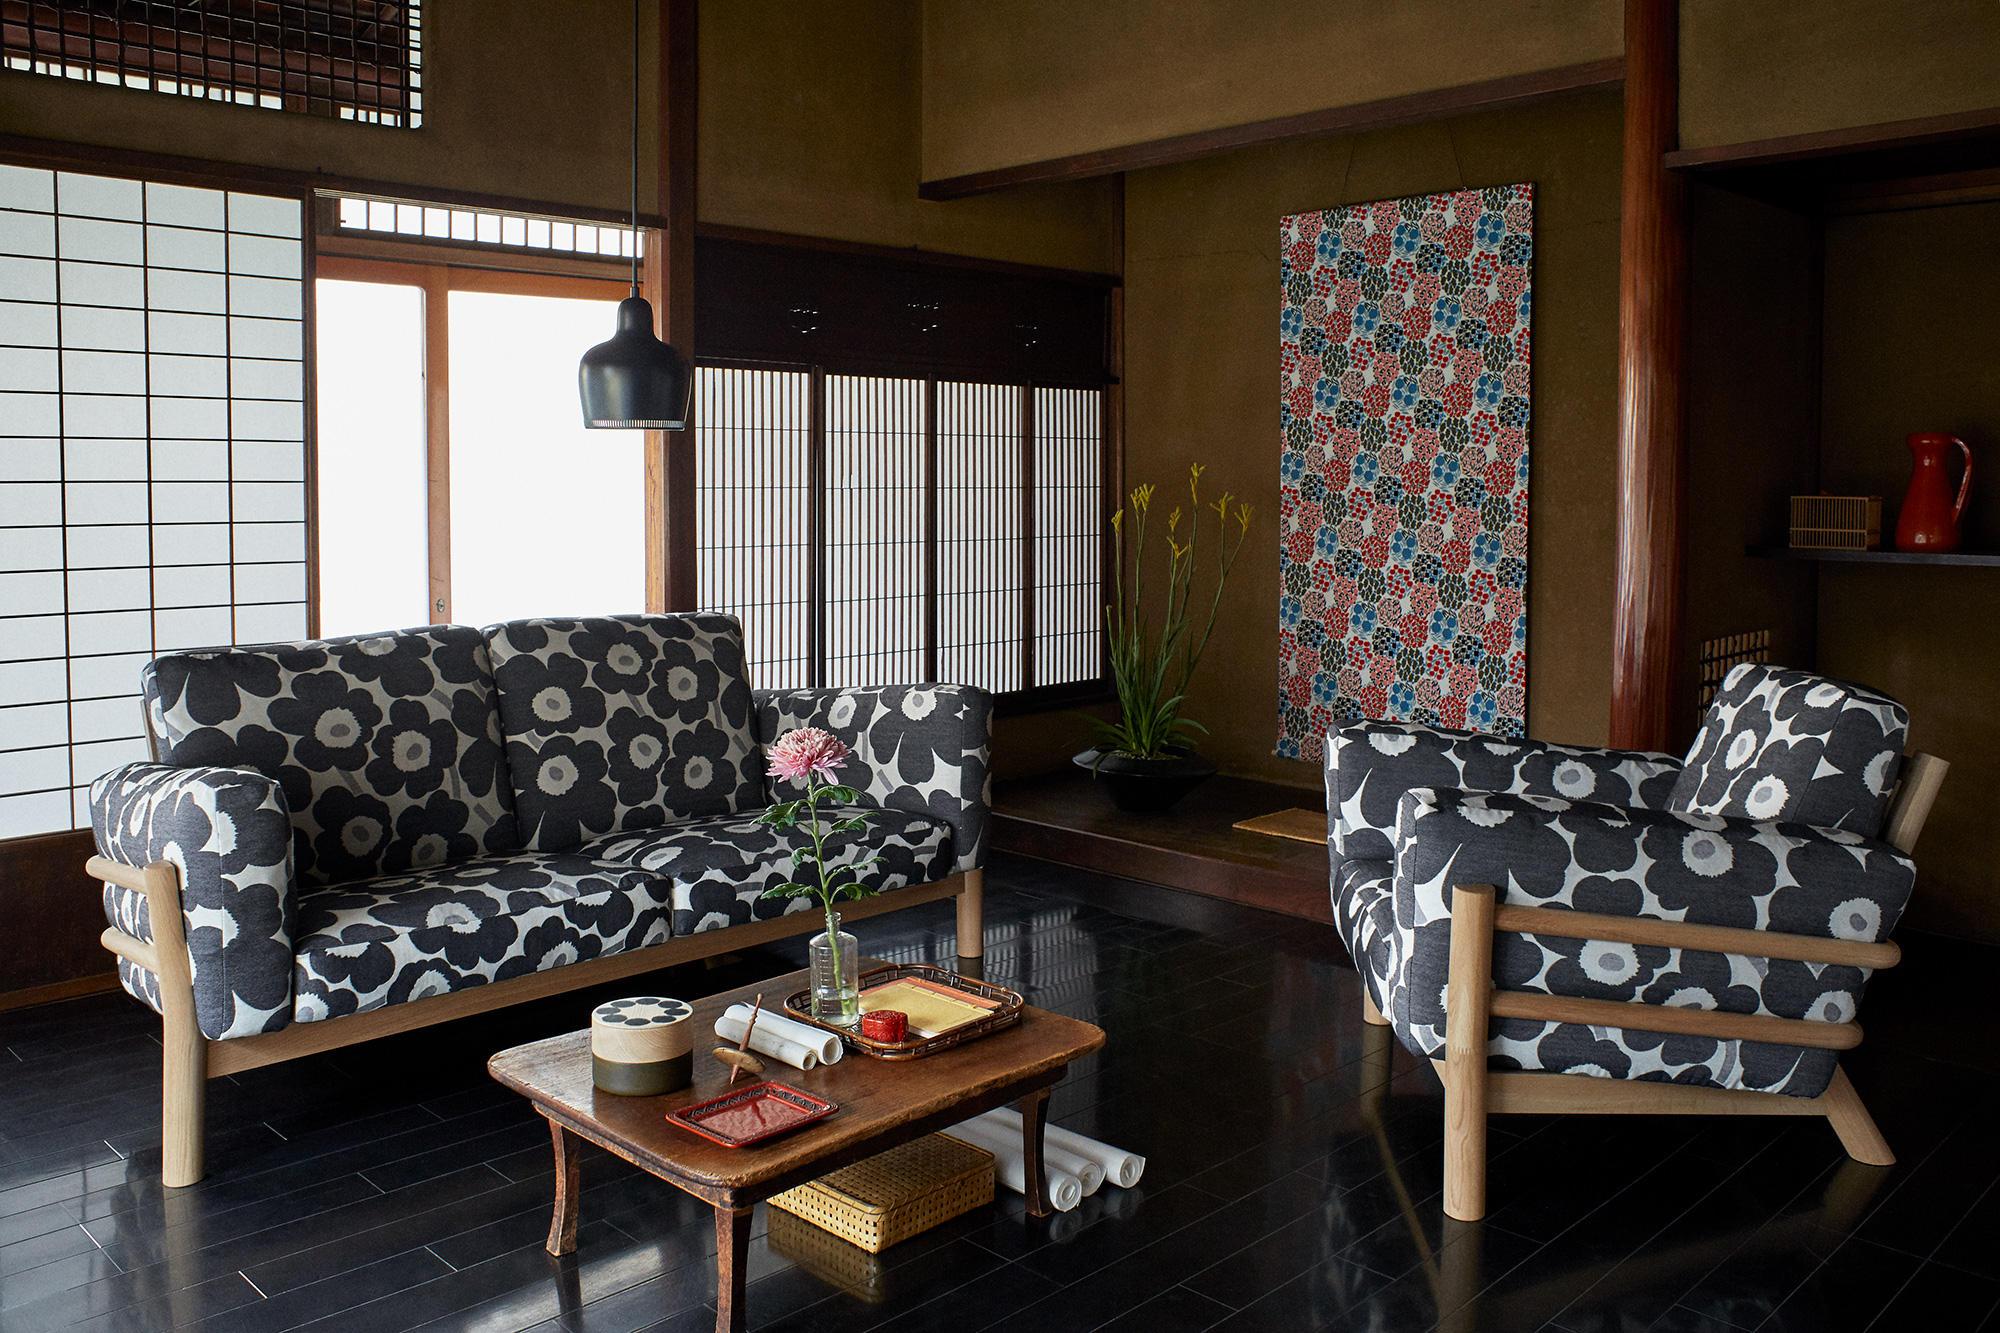 6.7-6.13 We love Japan - The Isetan edition